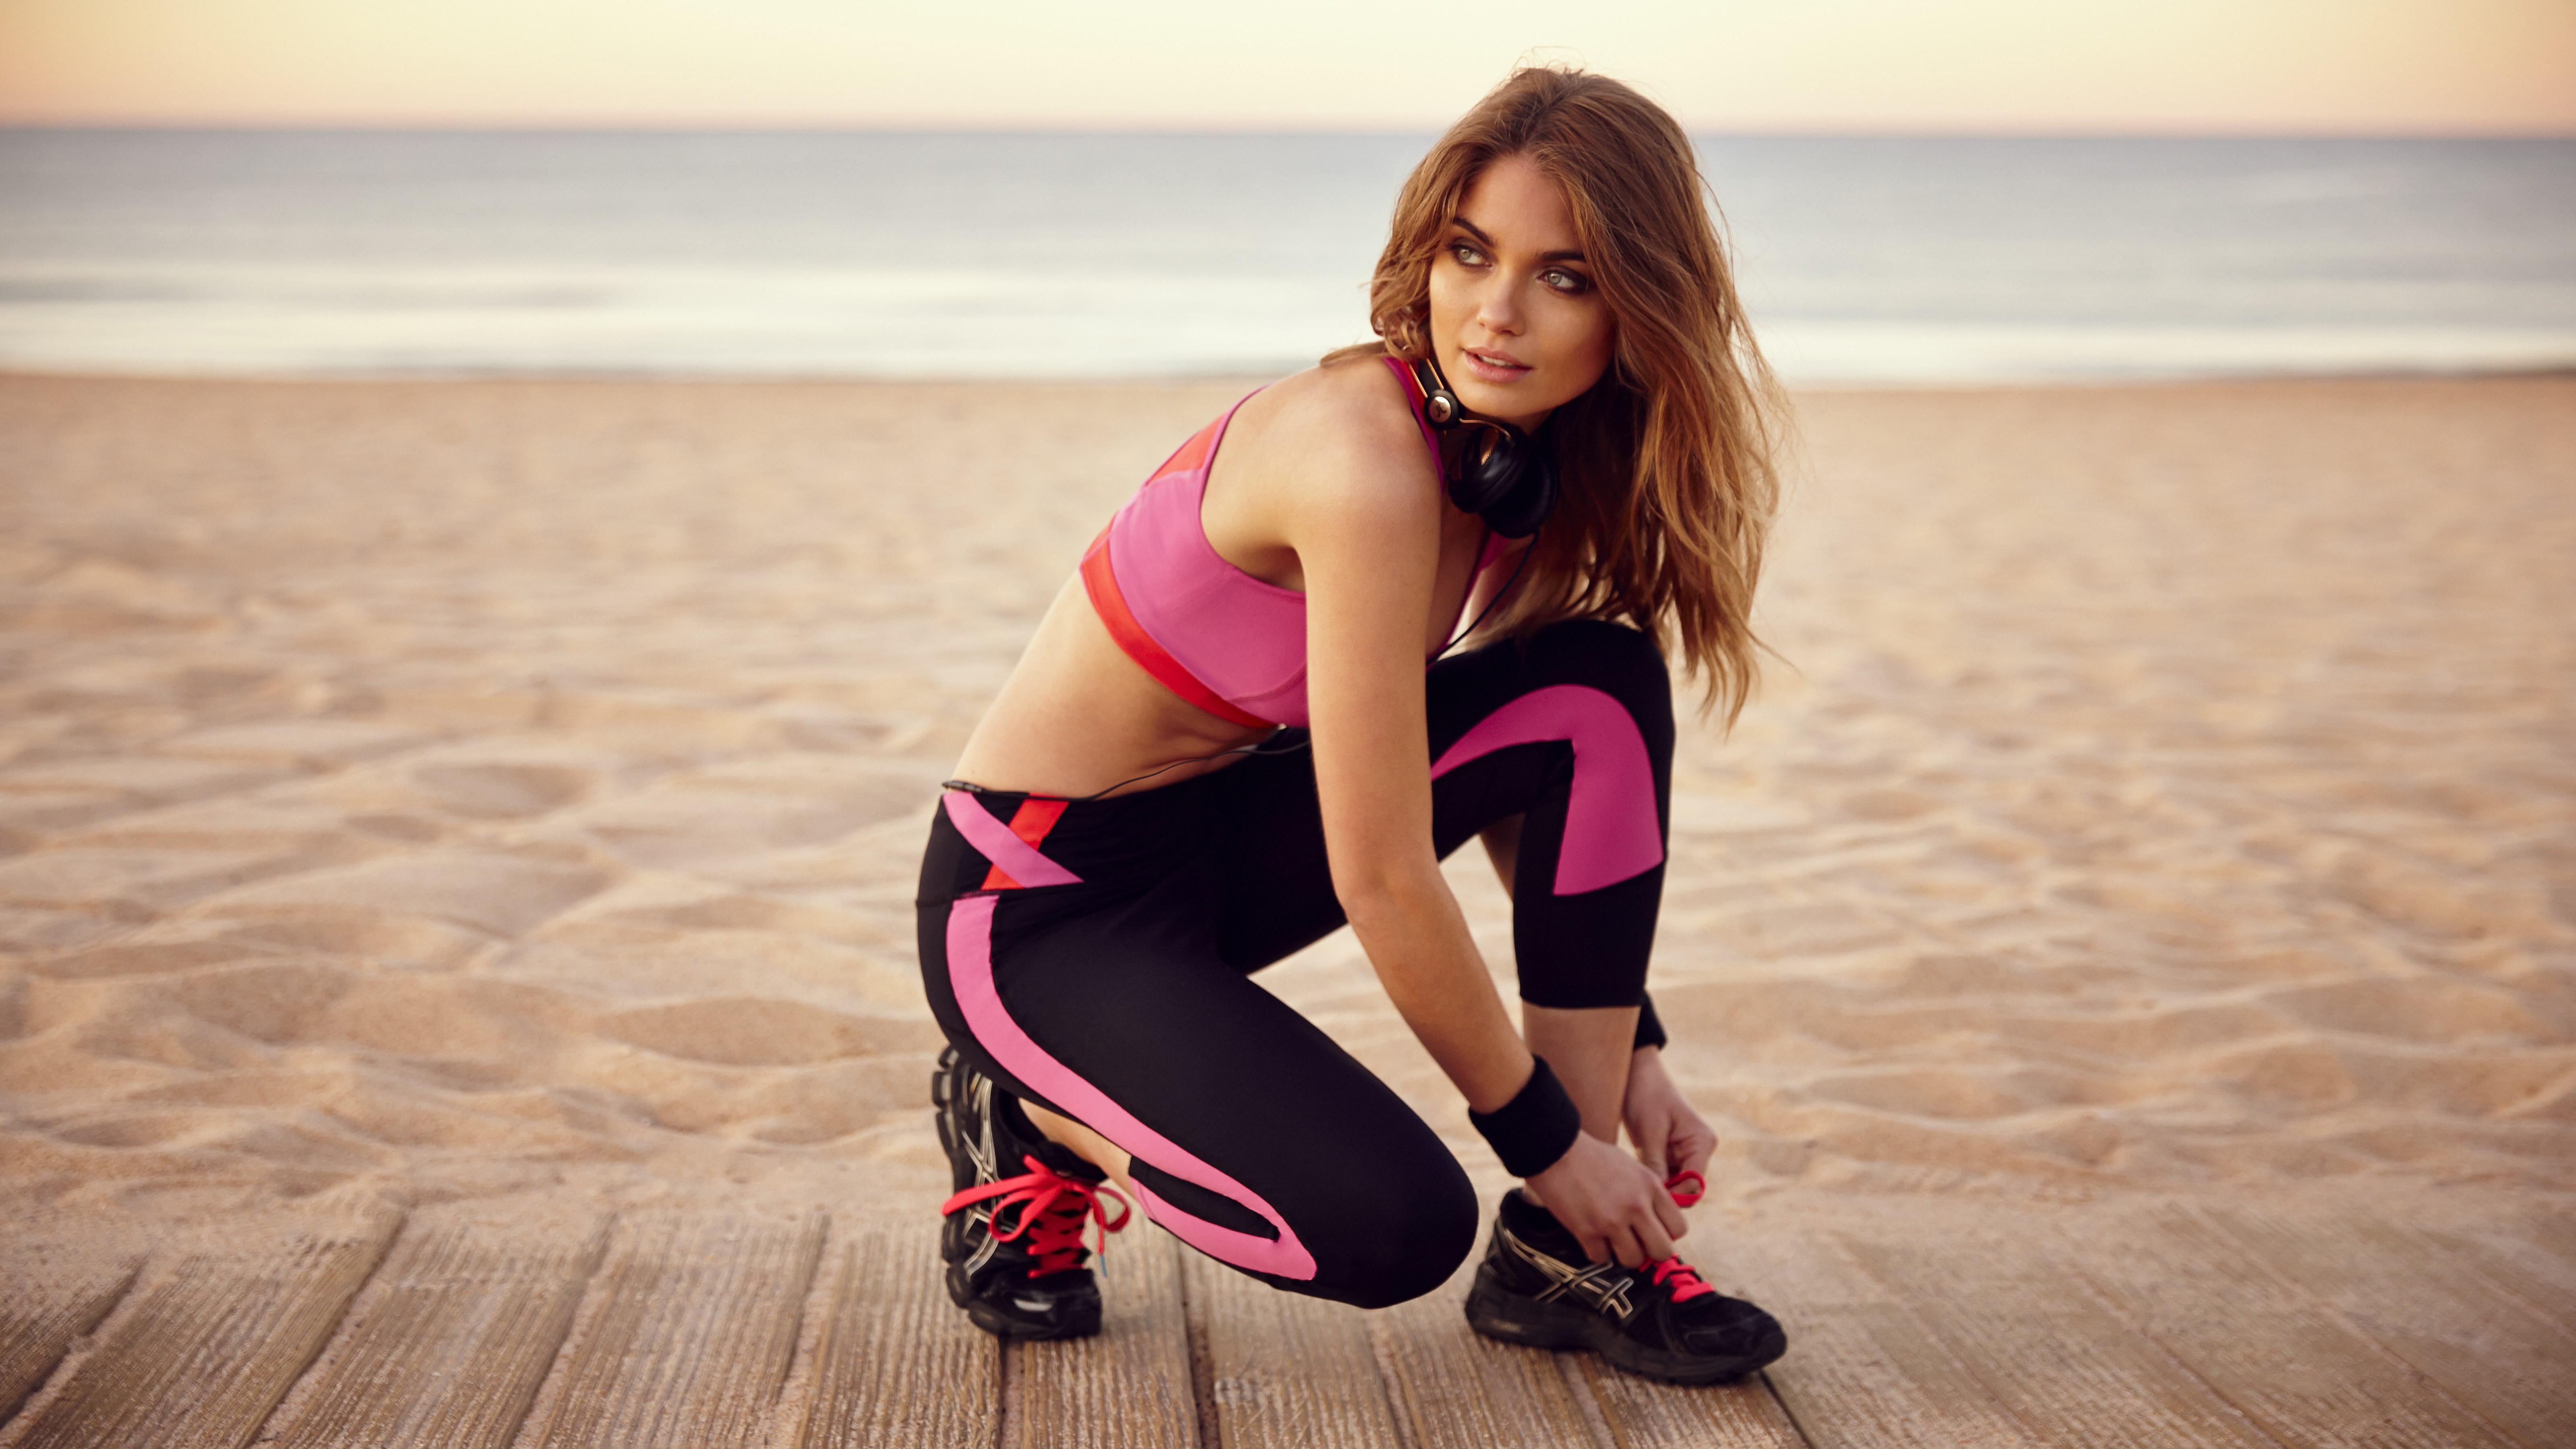 Hot women runners sexy